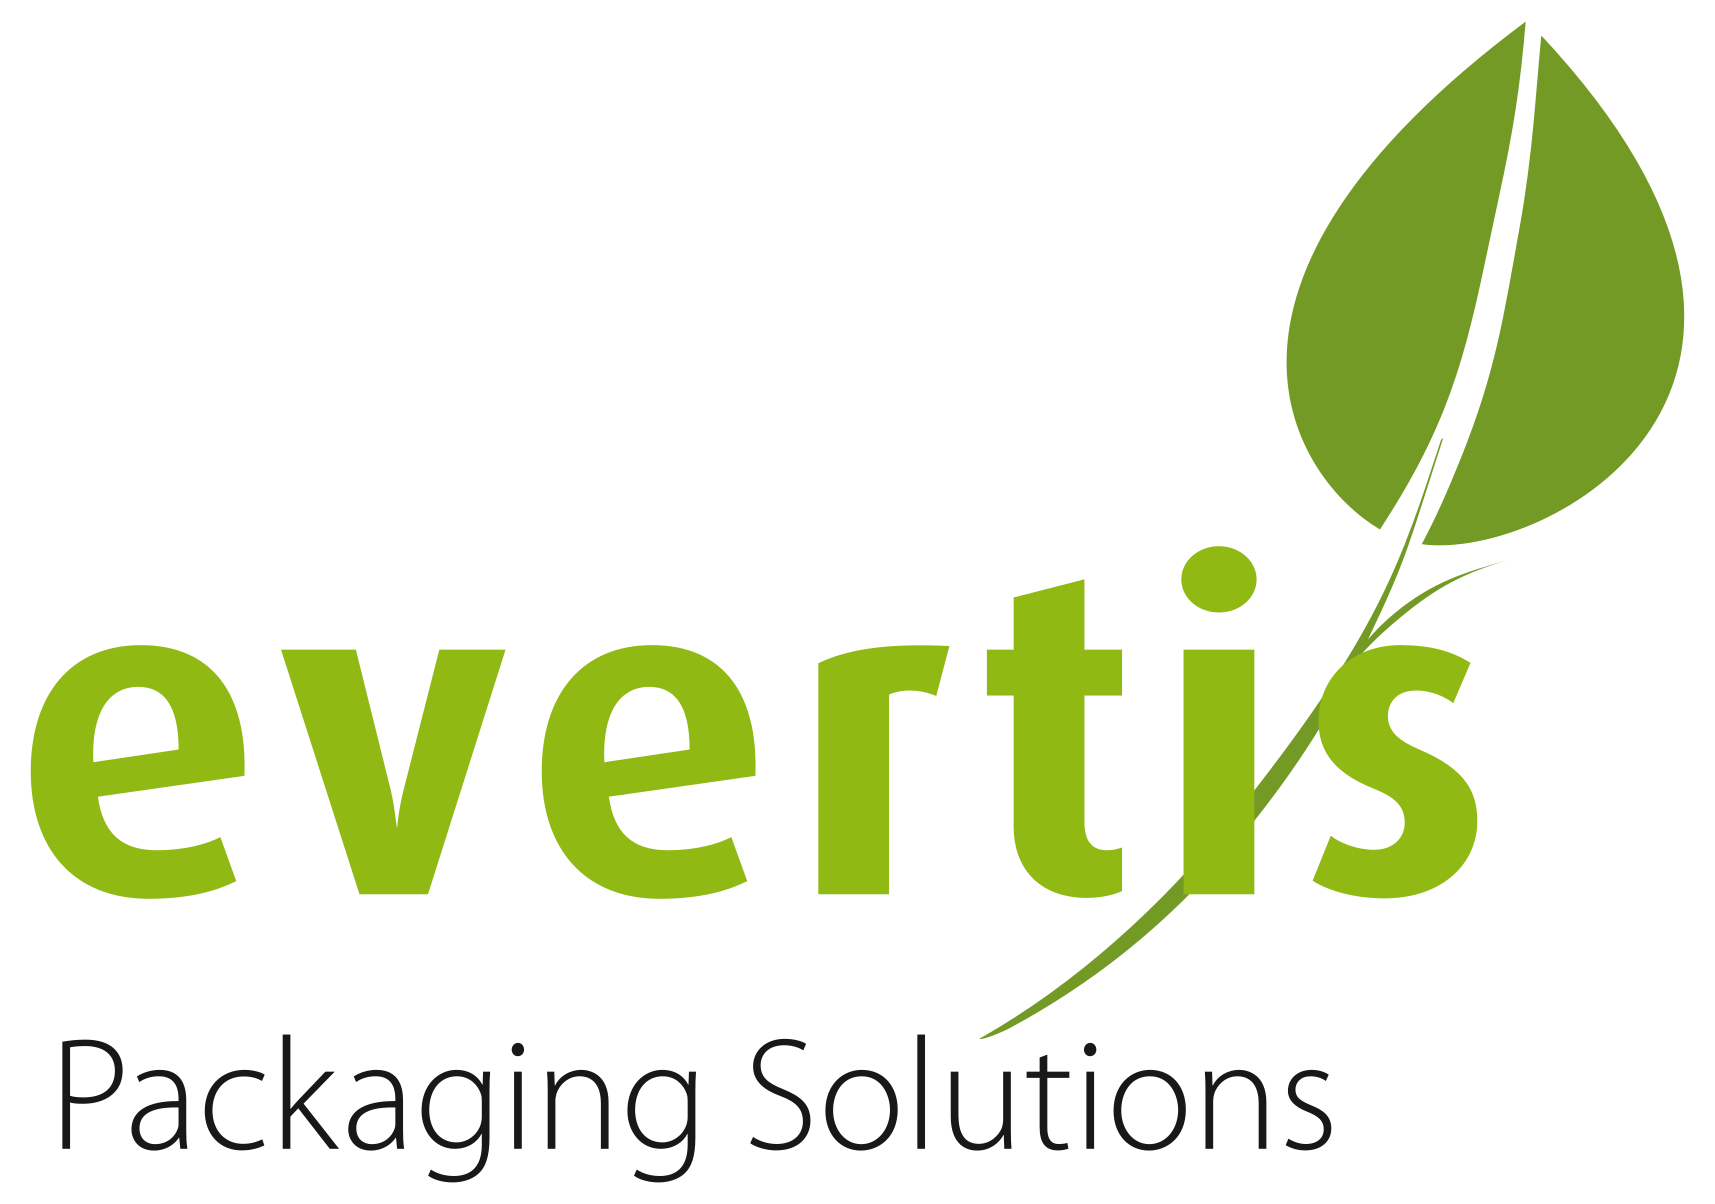 https://europeanplasticspact.org/wp-content/uploads/2020/03/Evertis.png